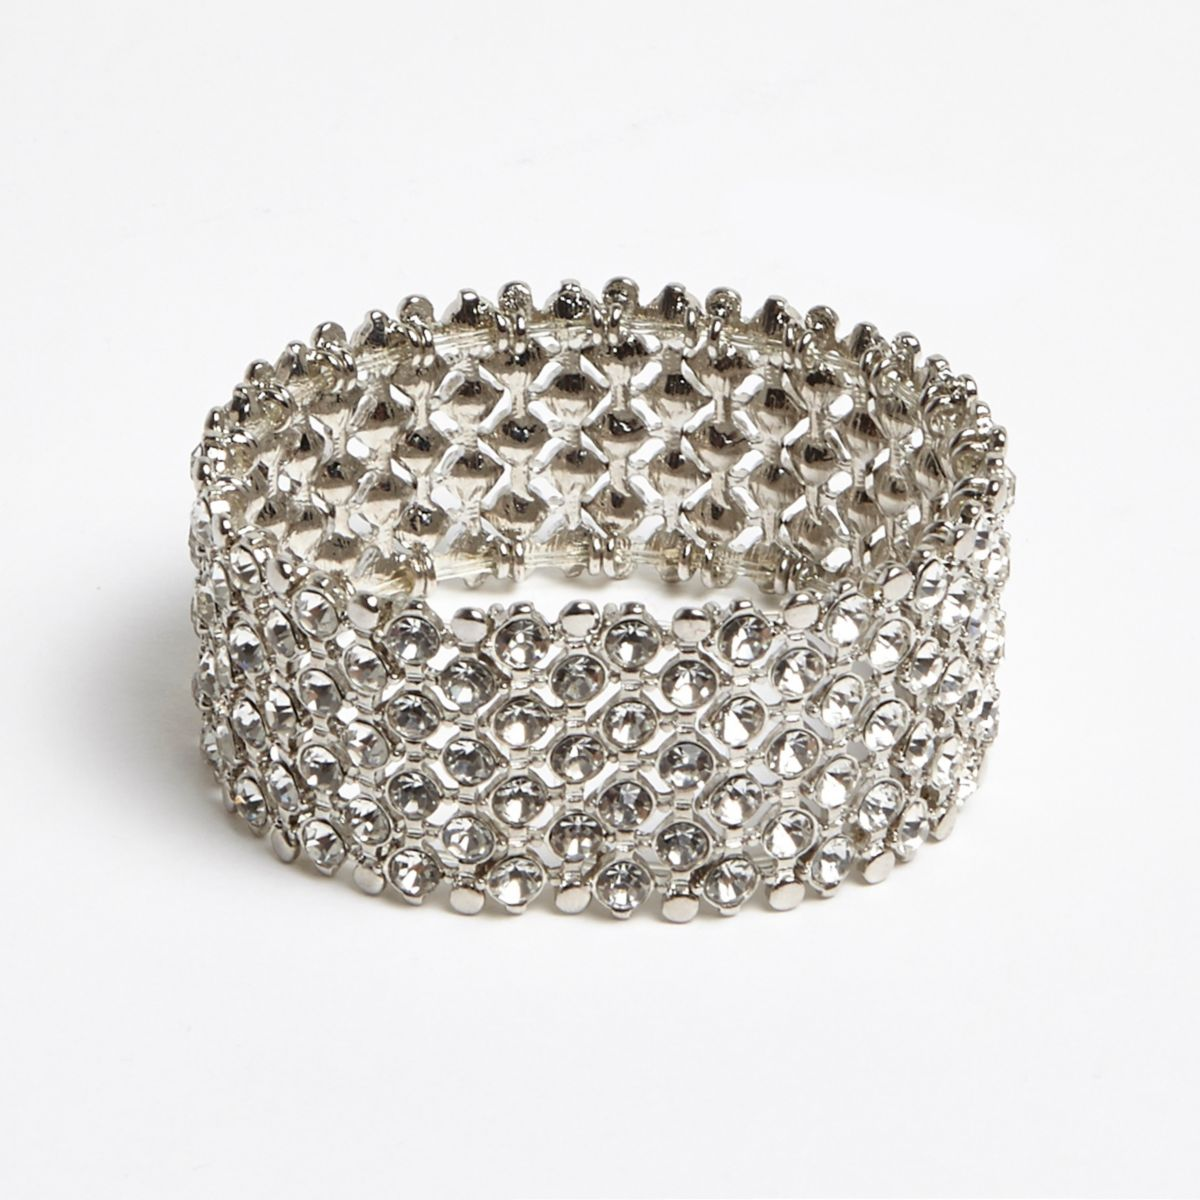 Silver tone diamante embellished bracelet